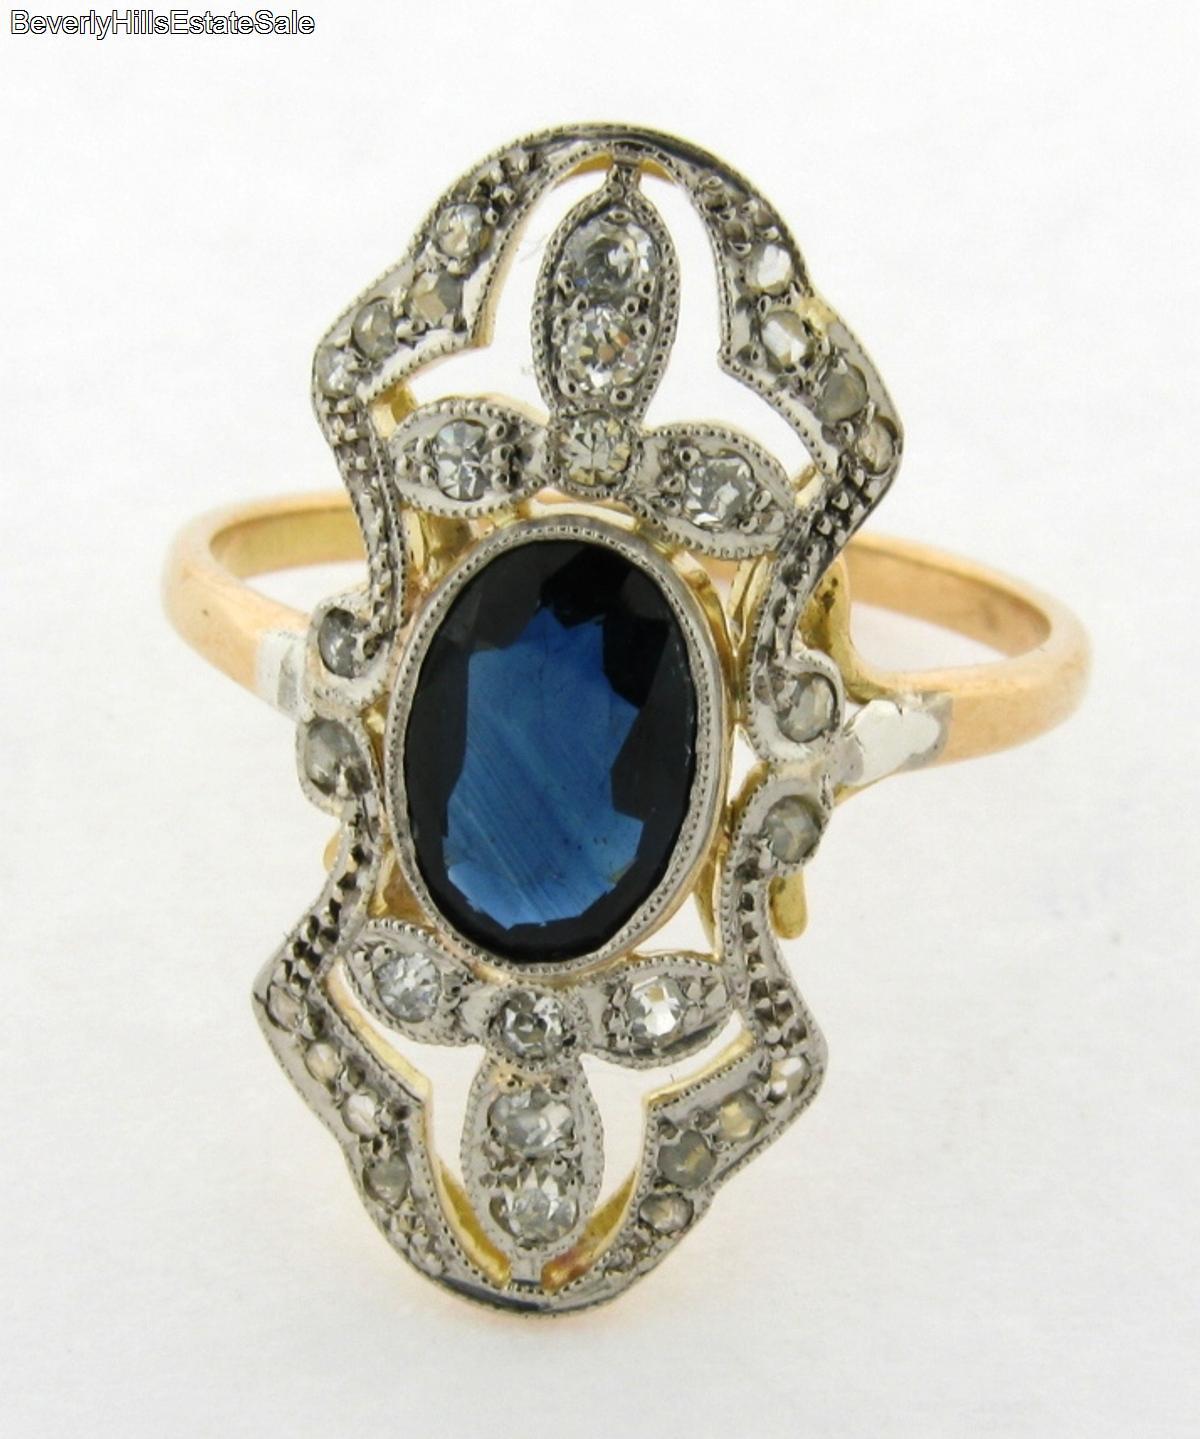 vintage 1 carat sapphire diamond 18k yellow gold ring ebay. Black Bedroom Furniture Sets. Home Design Ideas